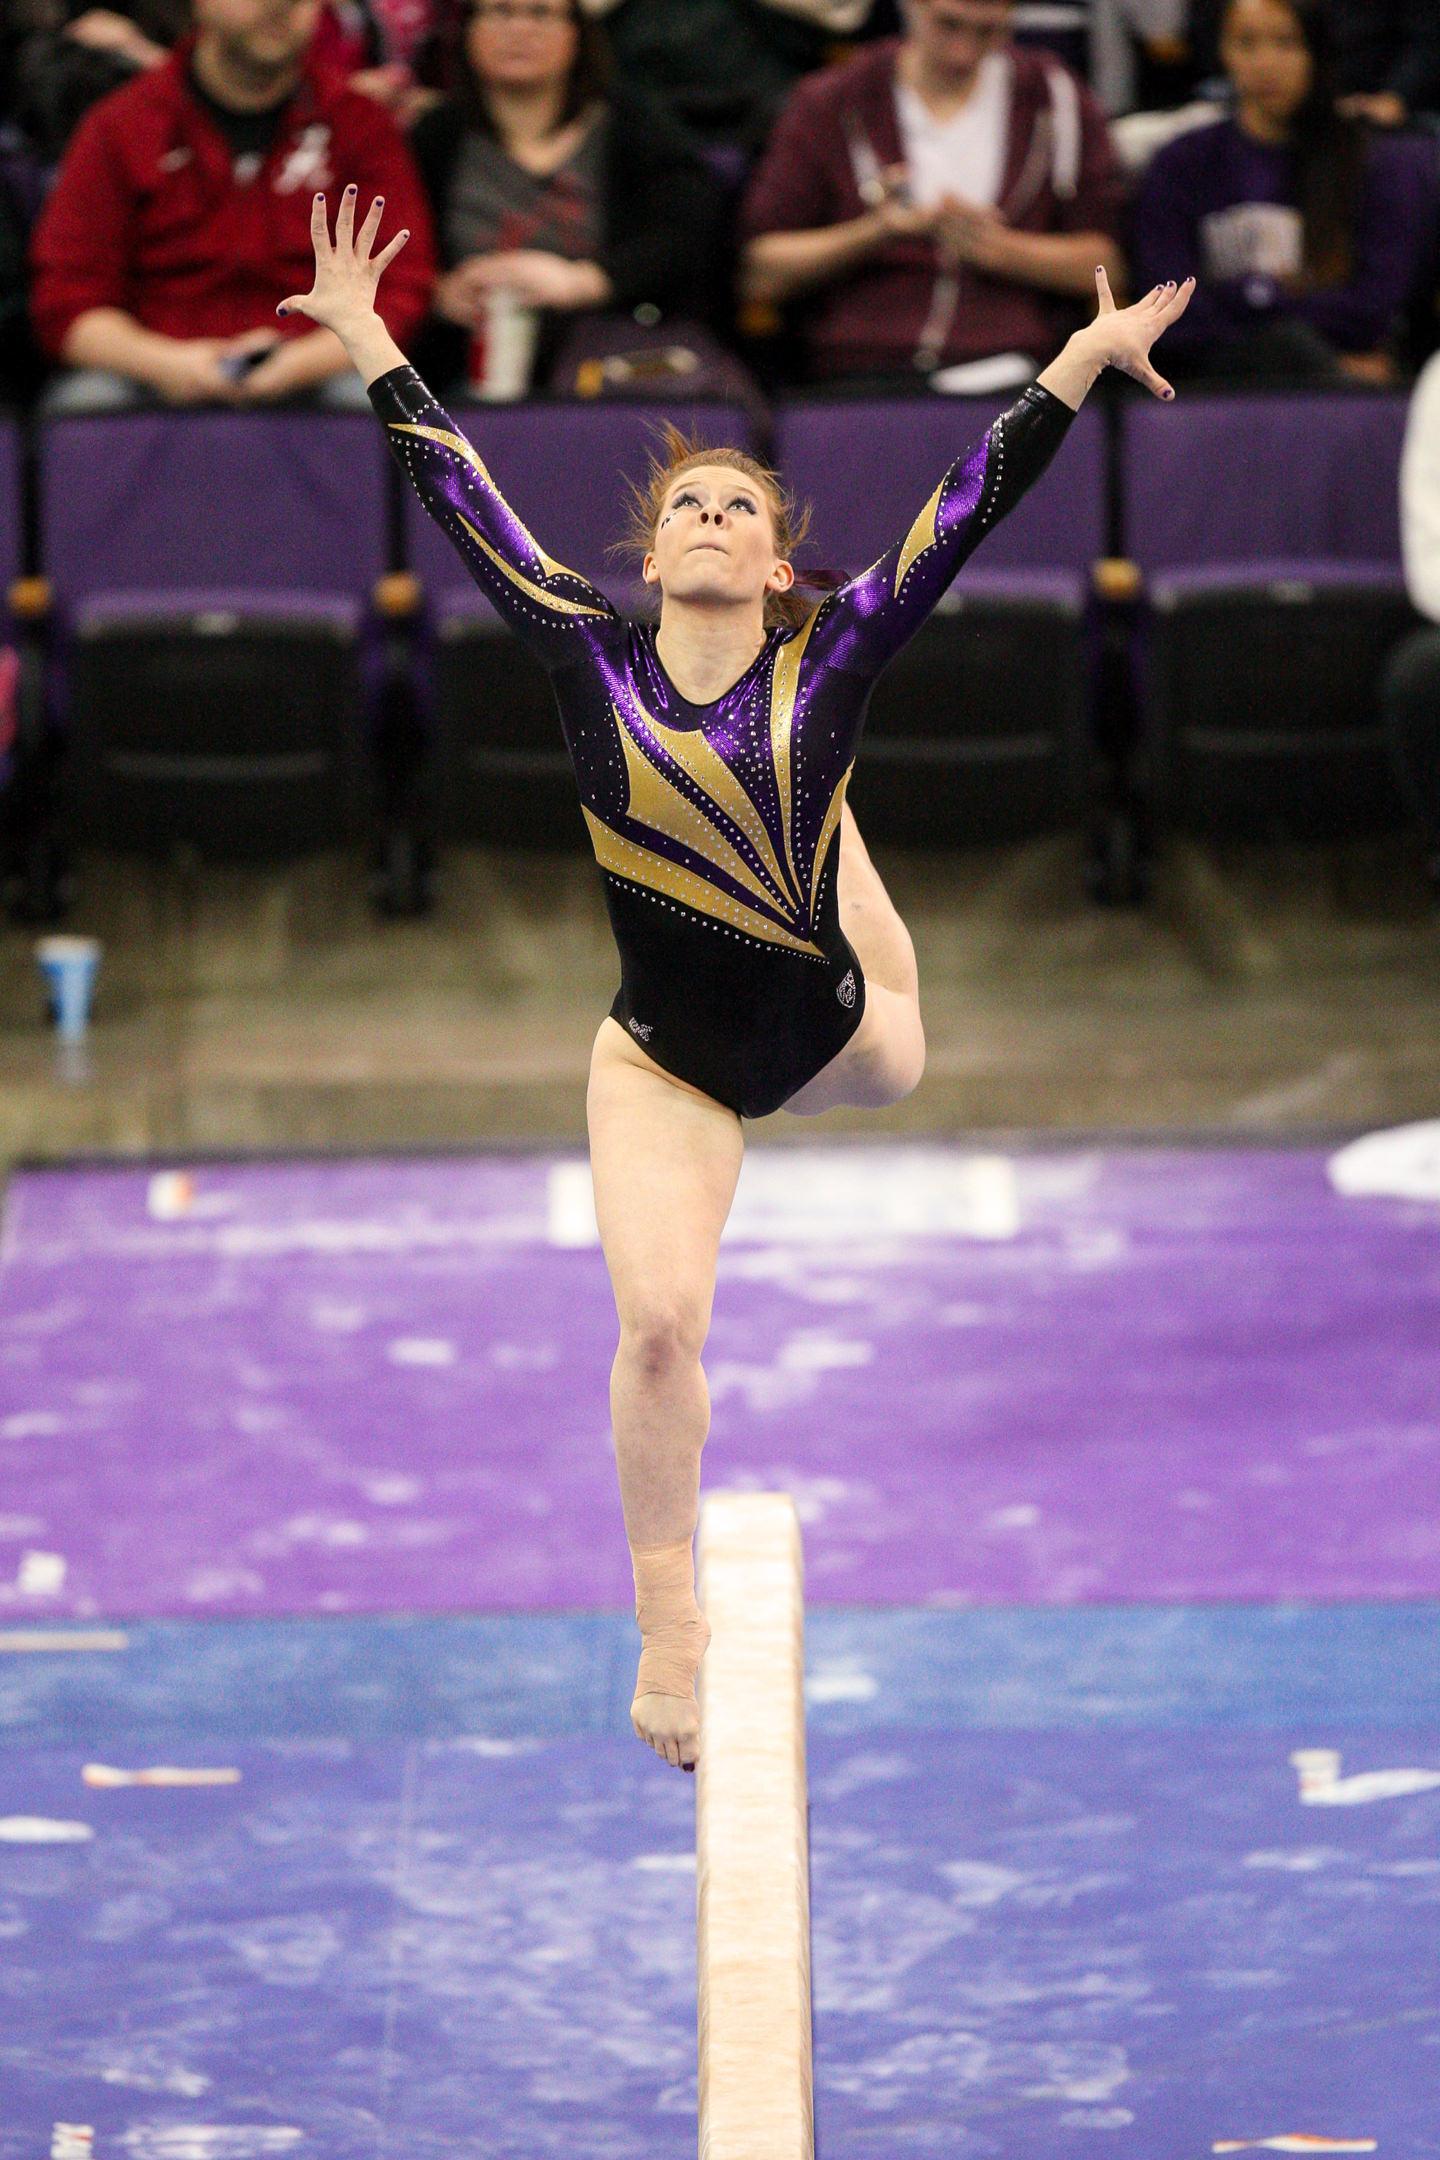 University of Washington Huskies Gymnast Jackie McCartin on Beam